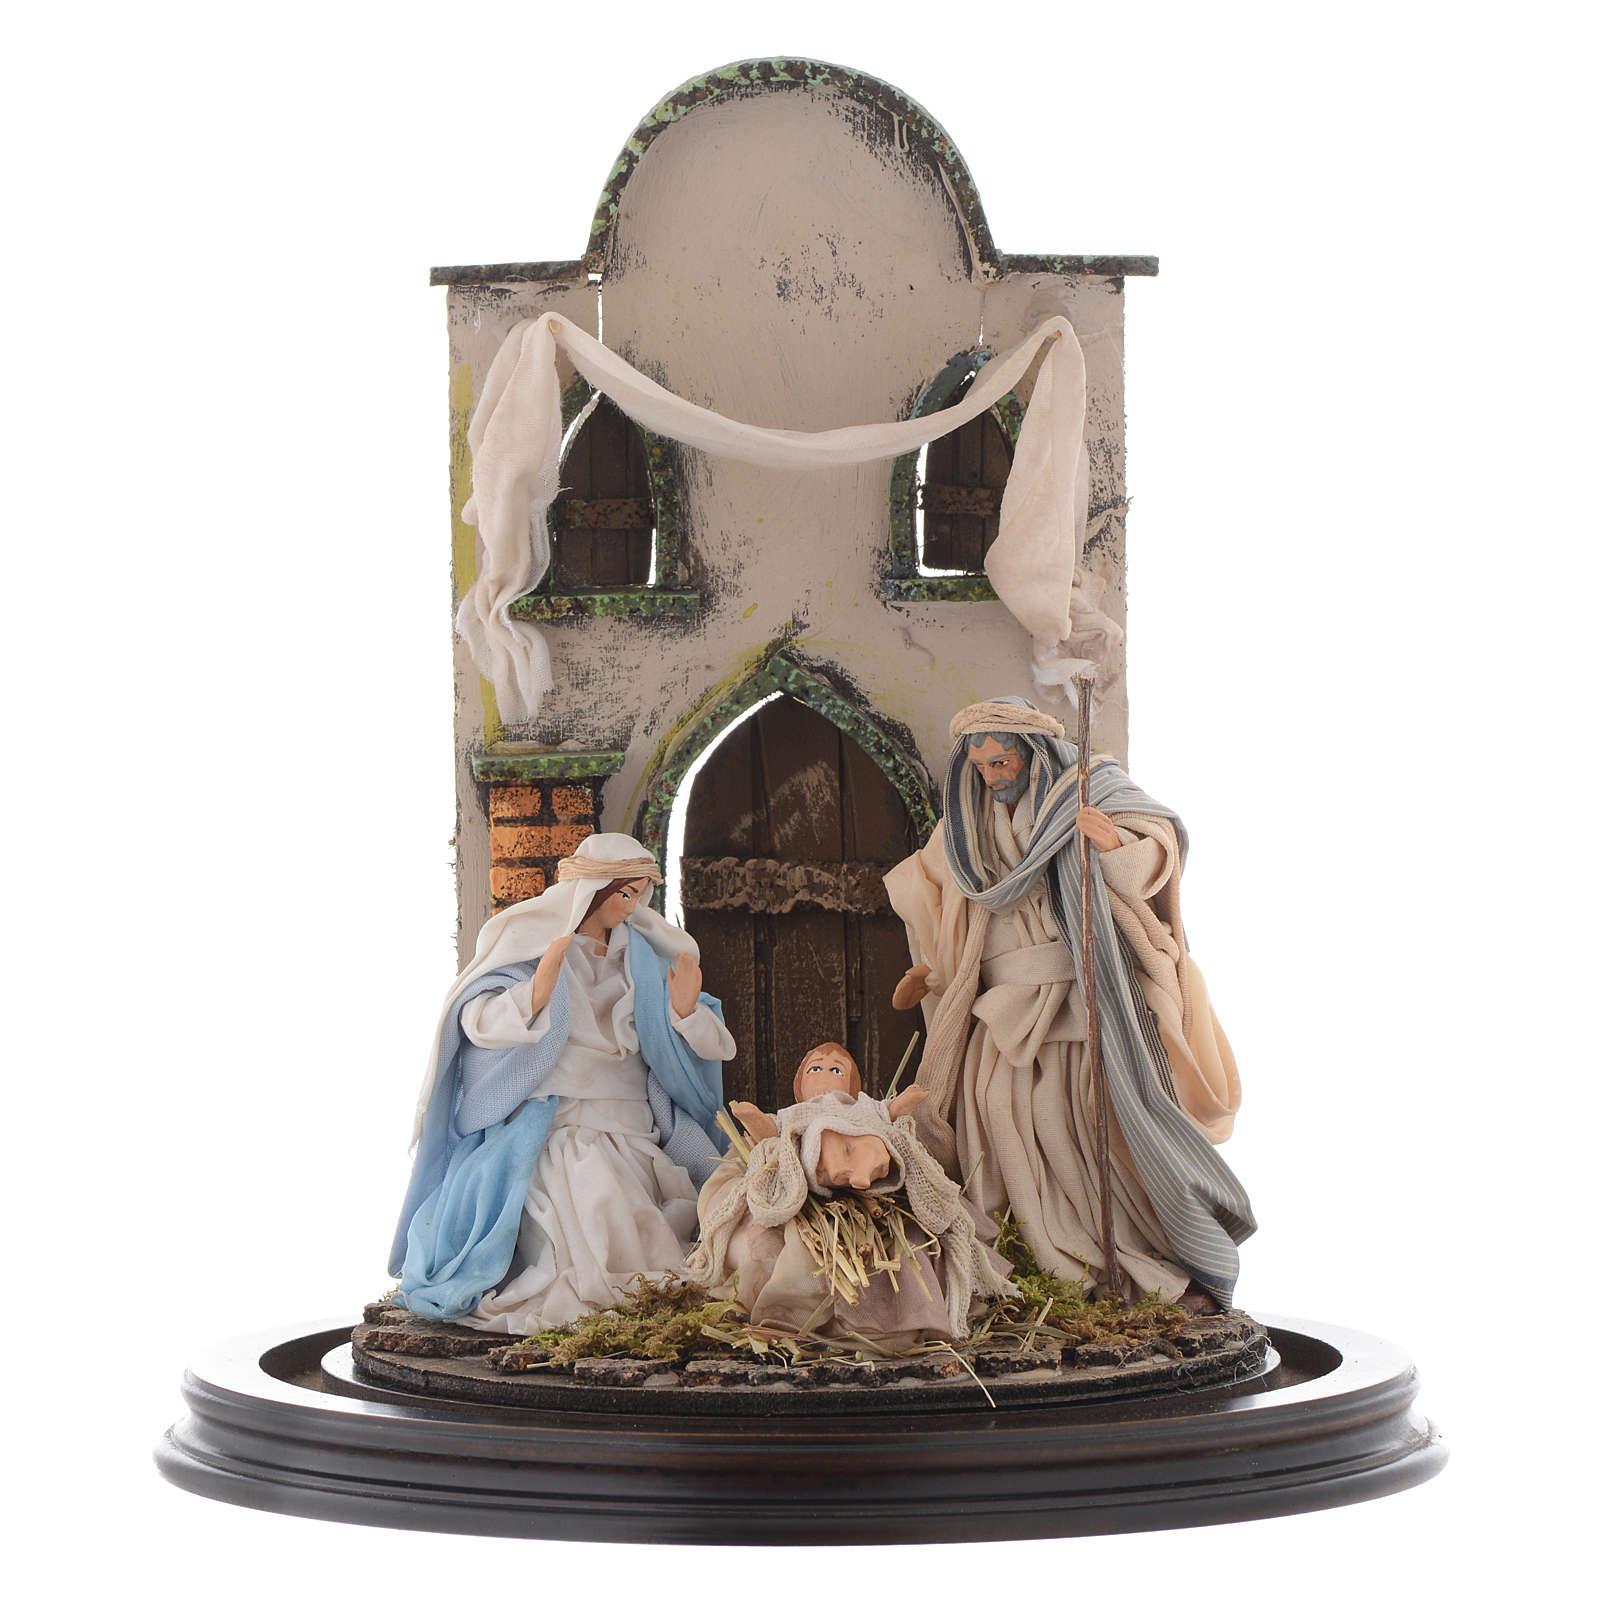 Escena Natividad 30x25 cm cúpula vidrio estilo árabe  pesebre napolitano 4